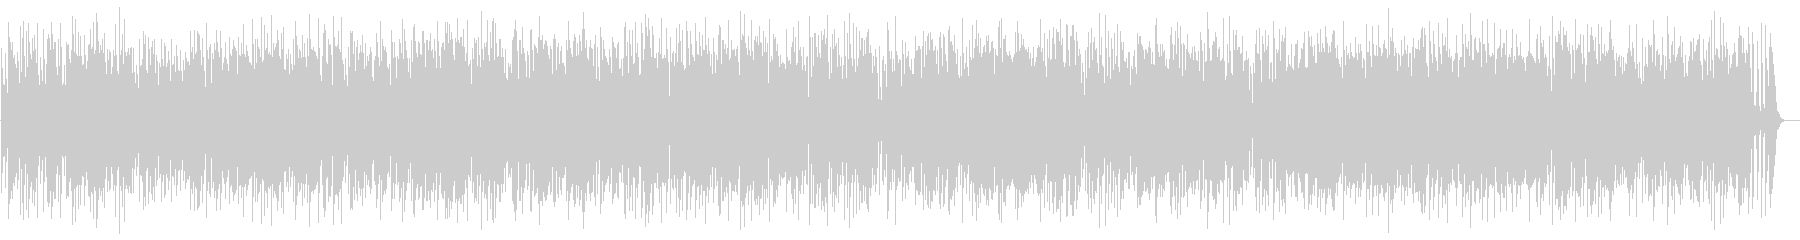 "Nocturne E major ""Nocturne No. 2""'s unreproduced waveform"